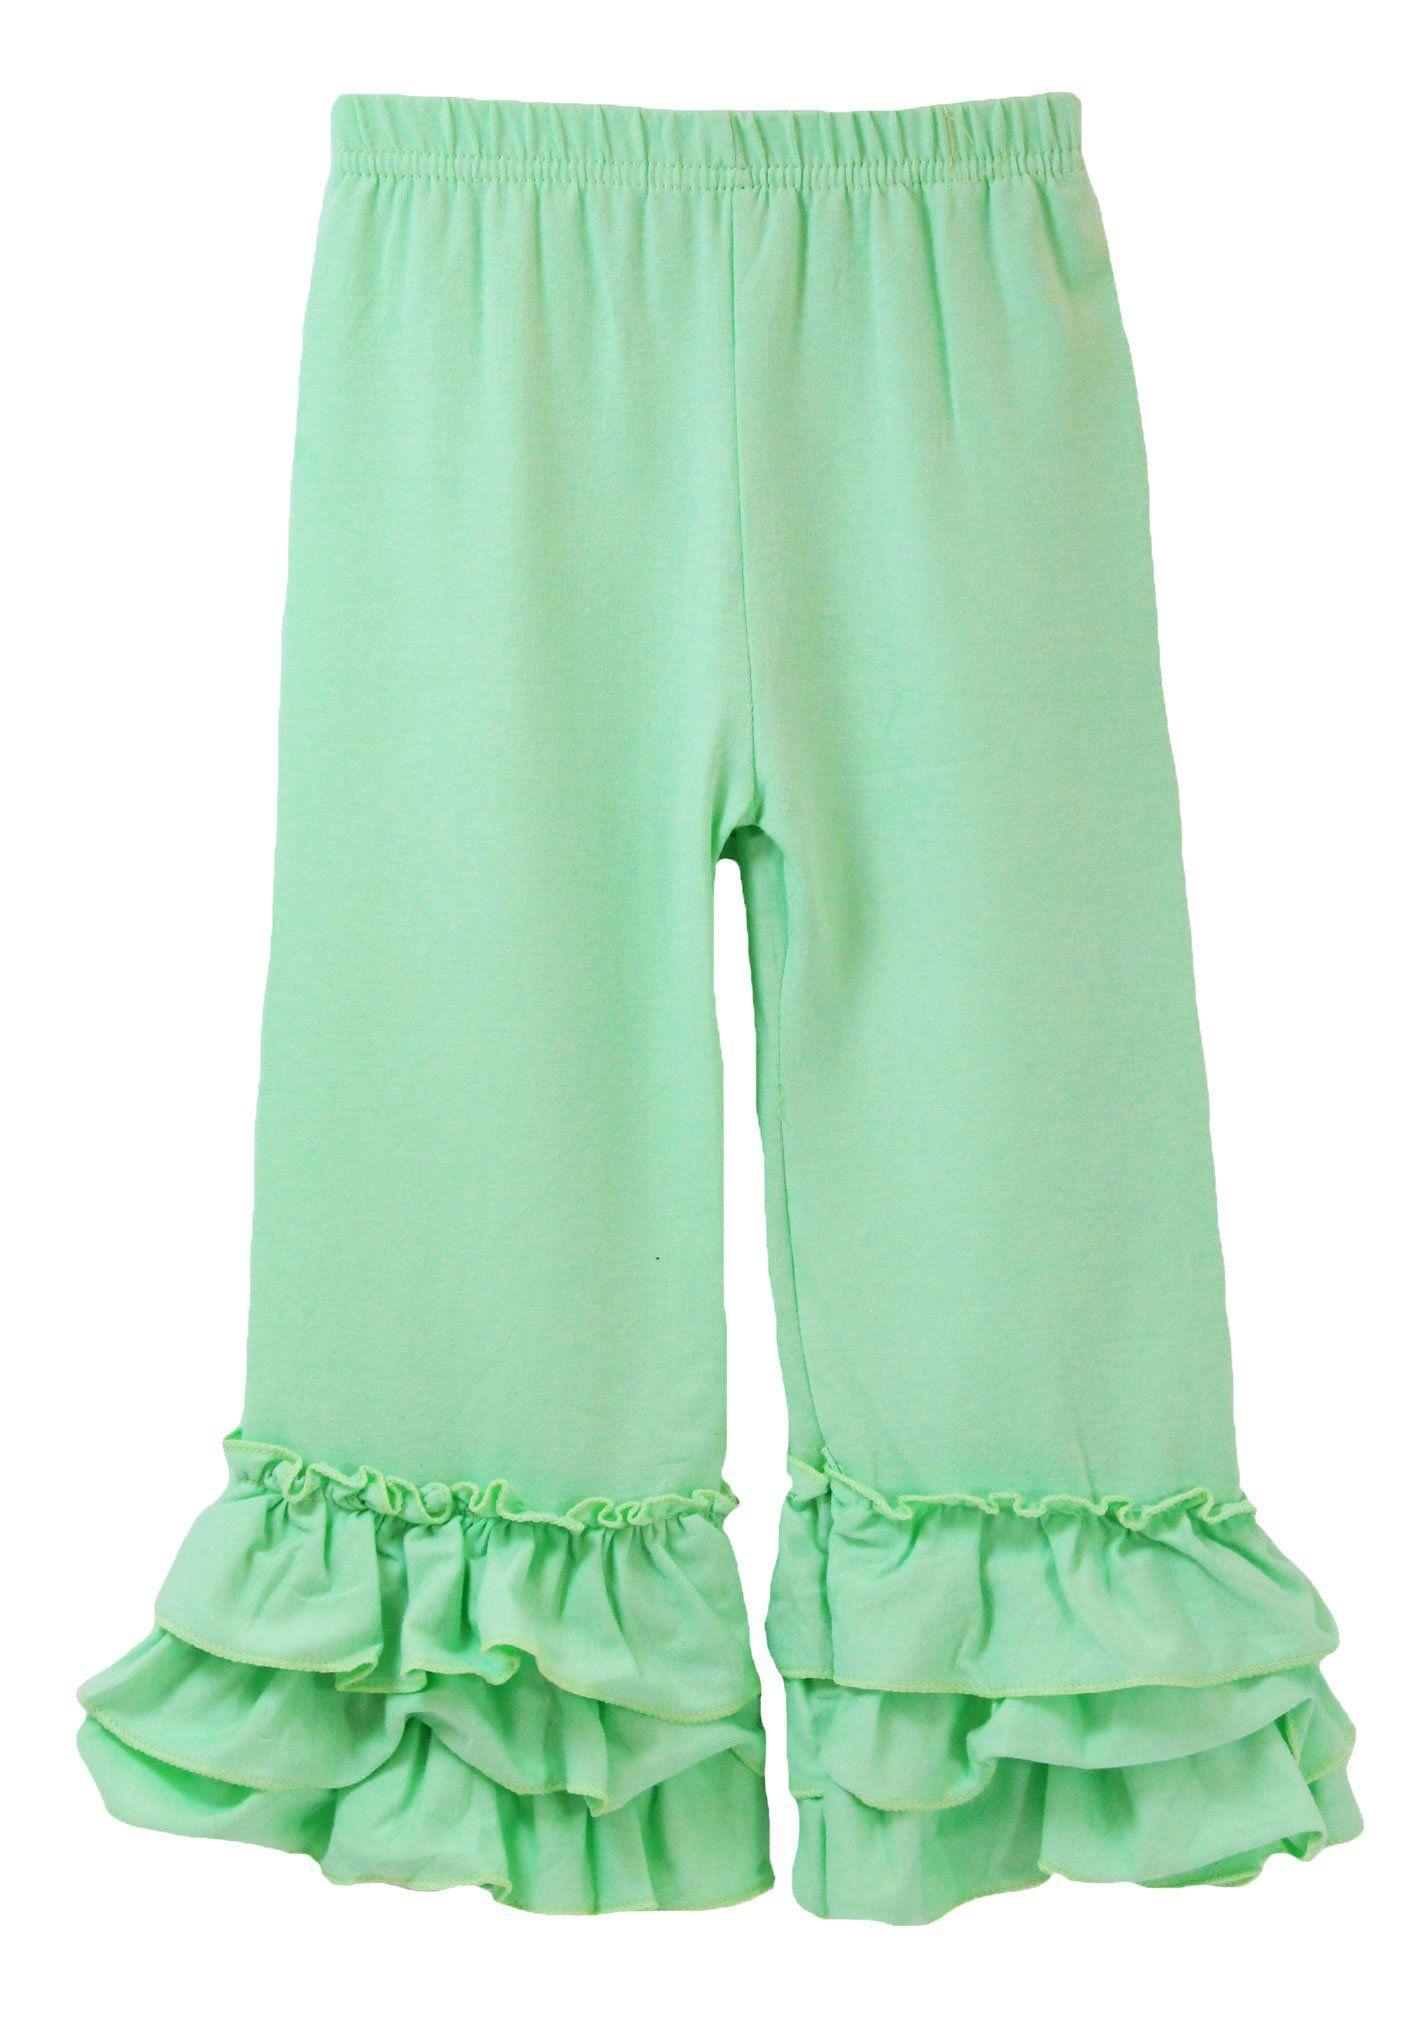 Little Girls Waterfall Ruffle Cuff Pants - Mint 2-3T